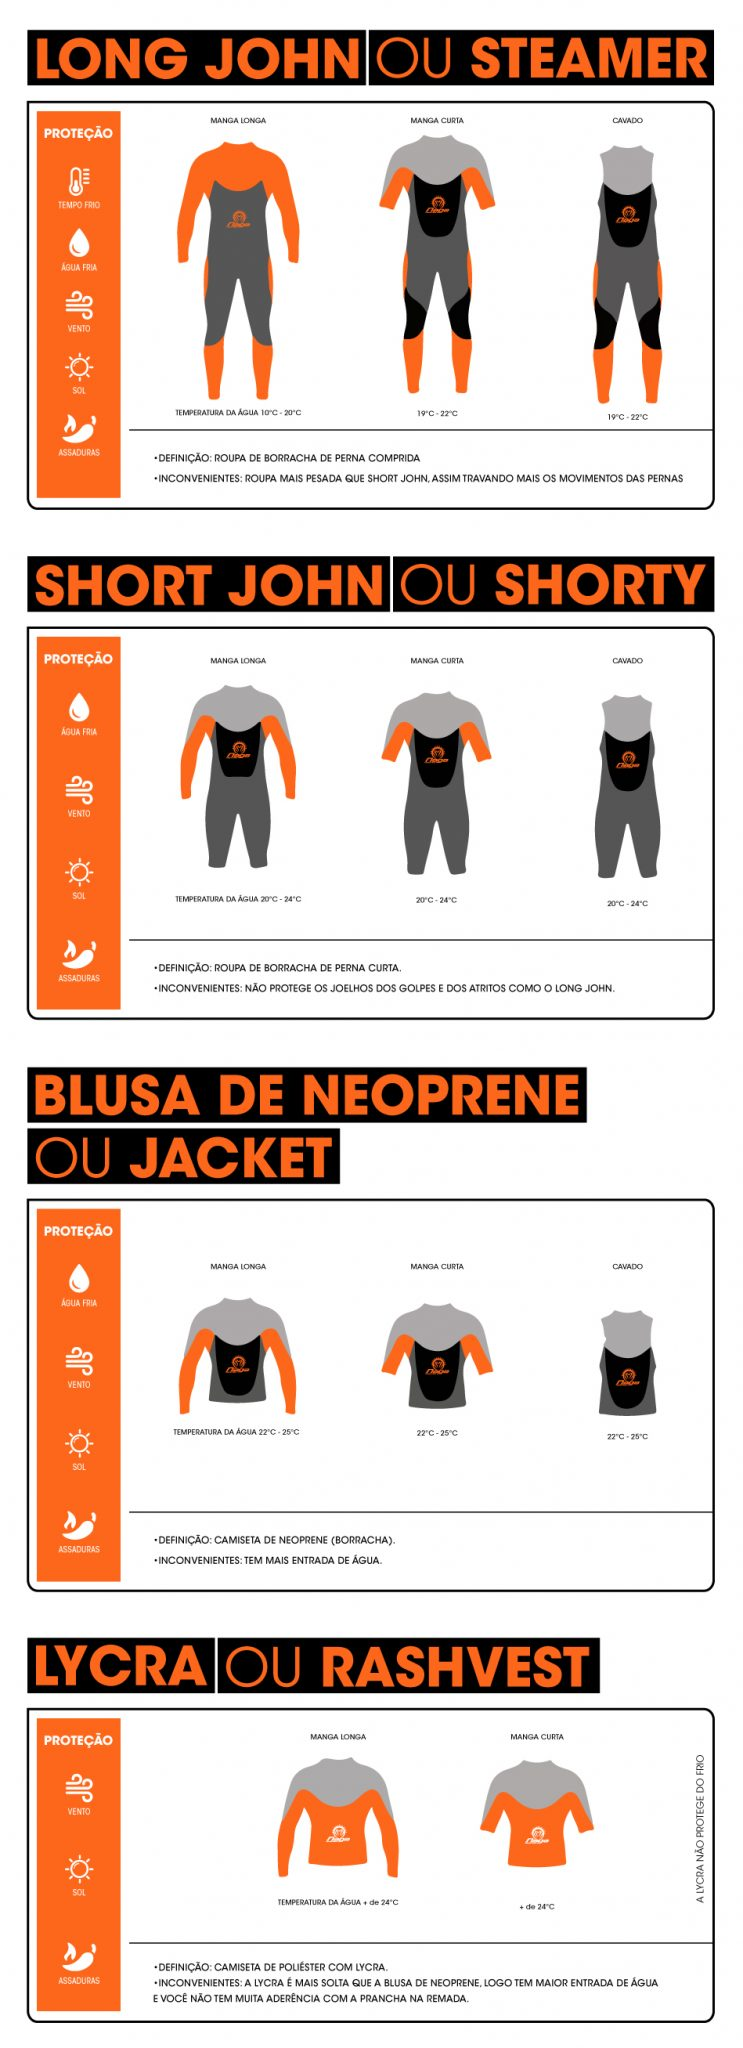 wetsuit_blog (1)